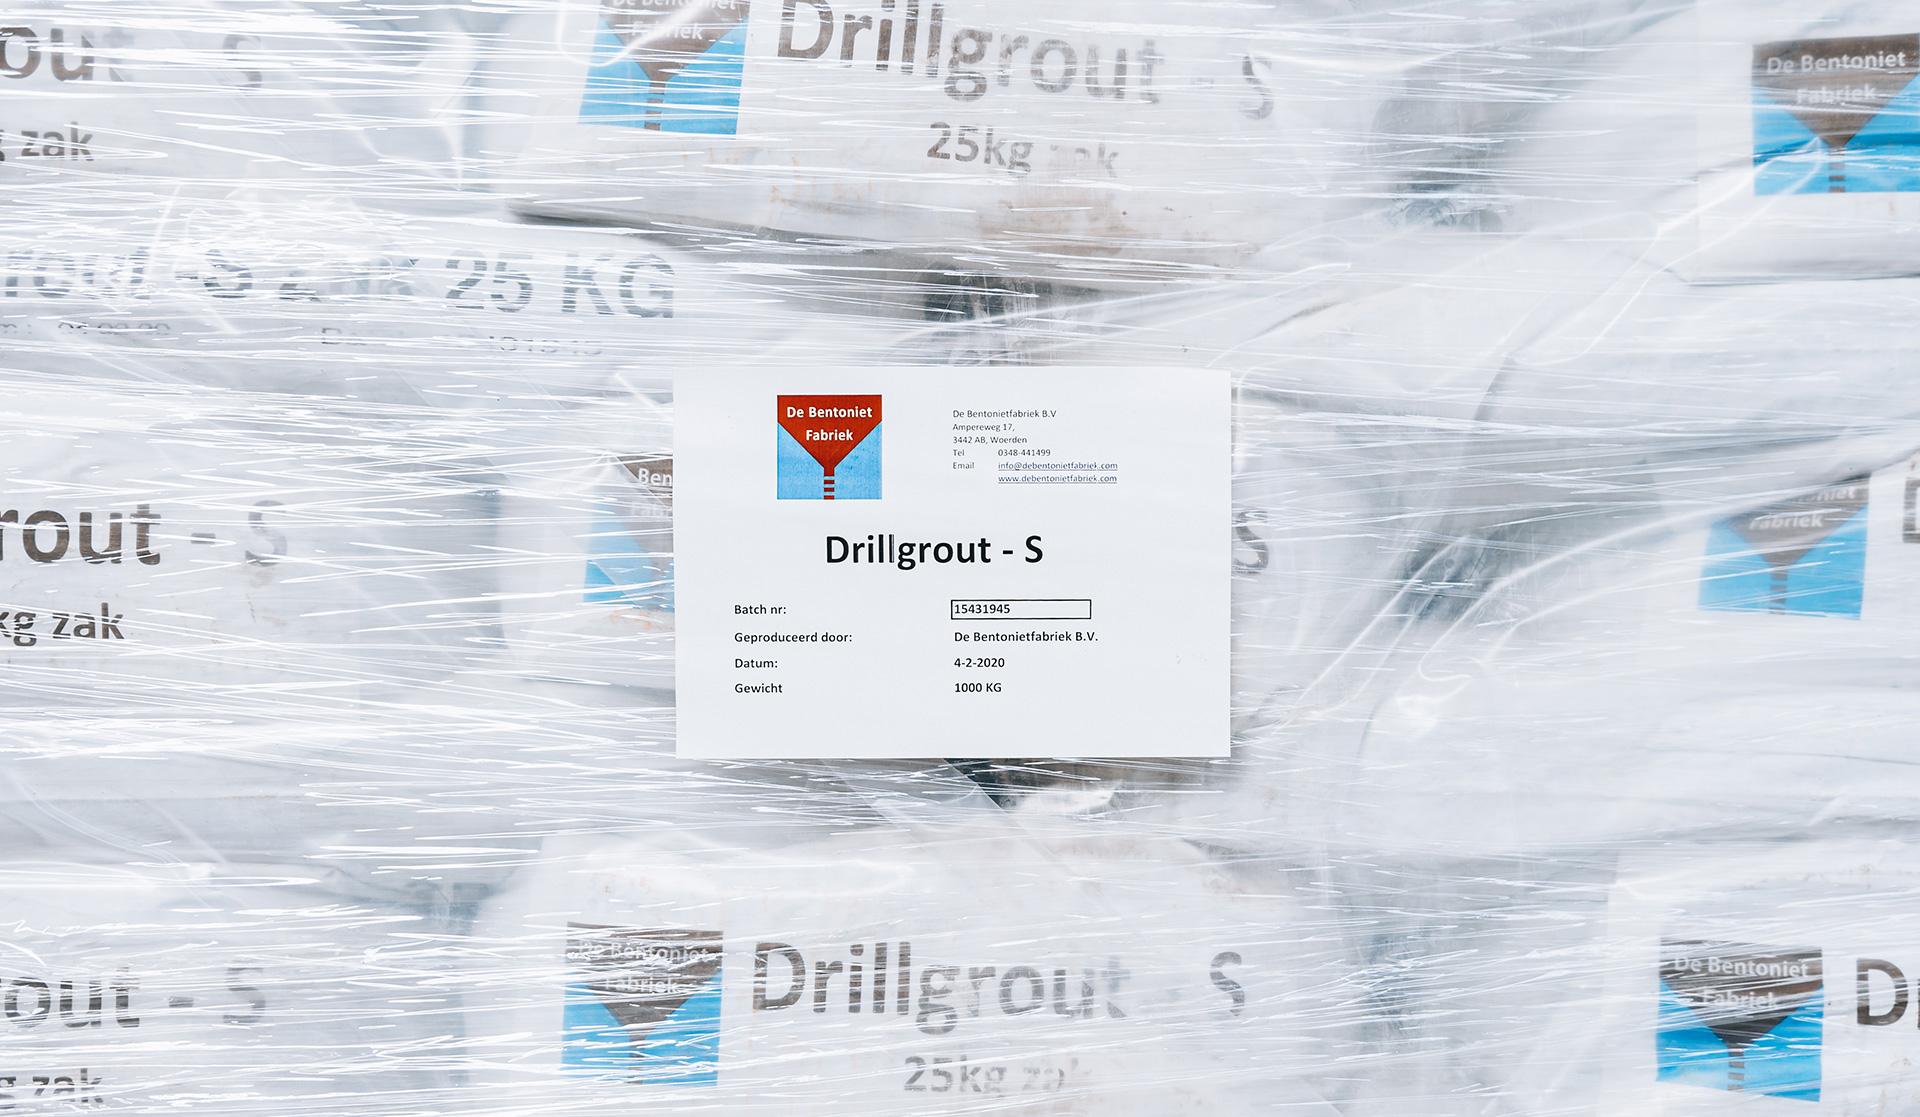 Bentoniet grout product drillgrout S